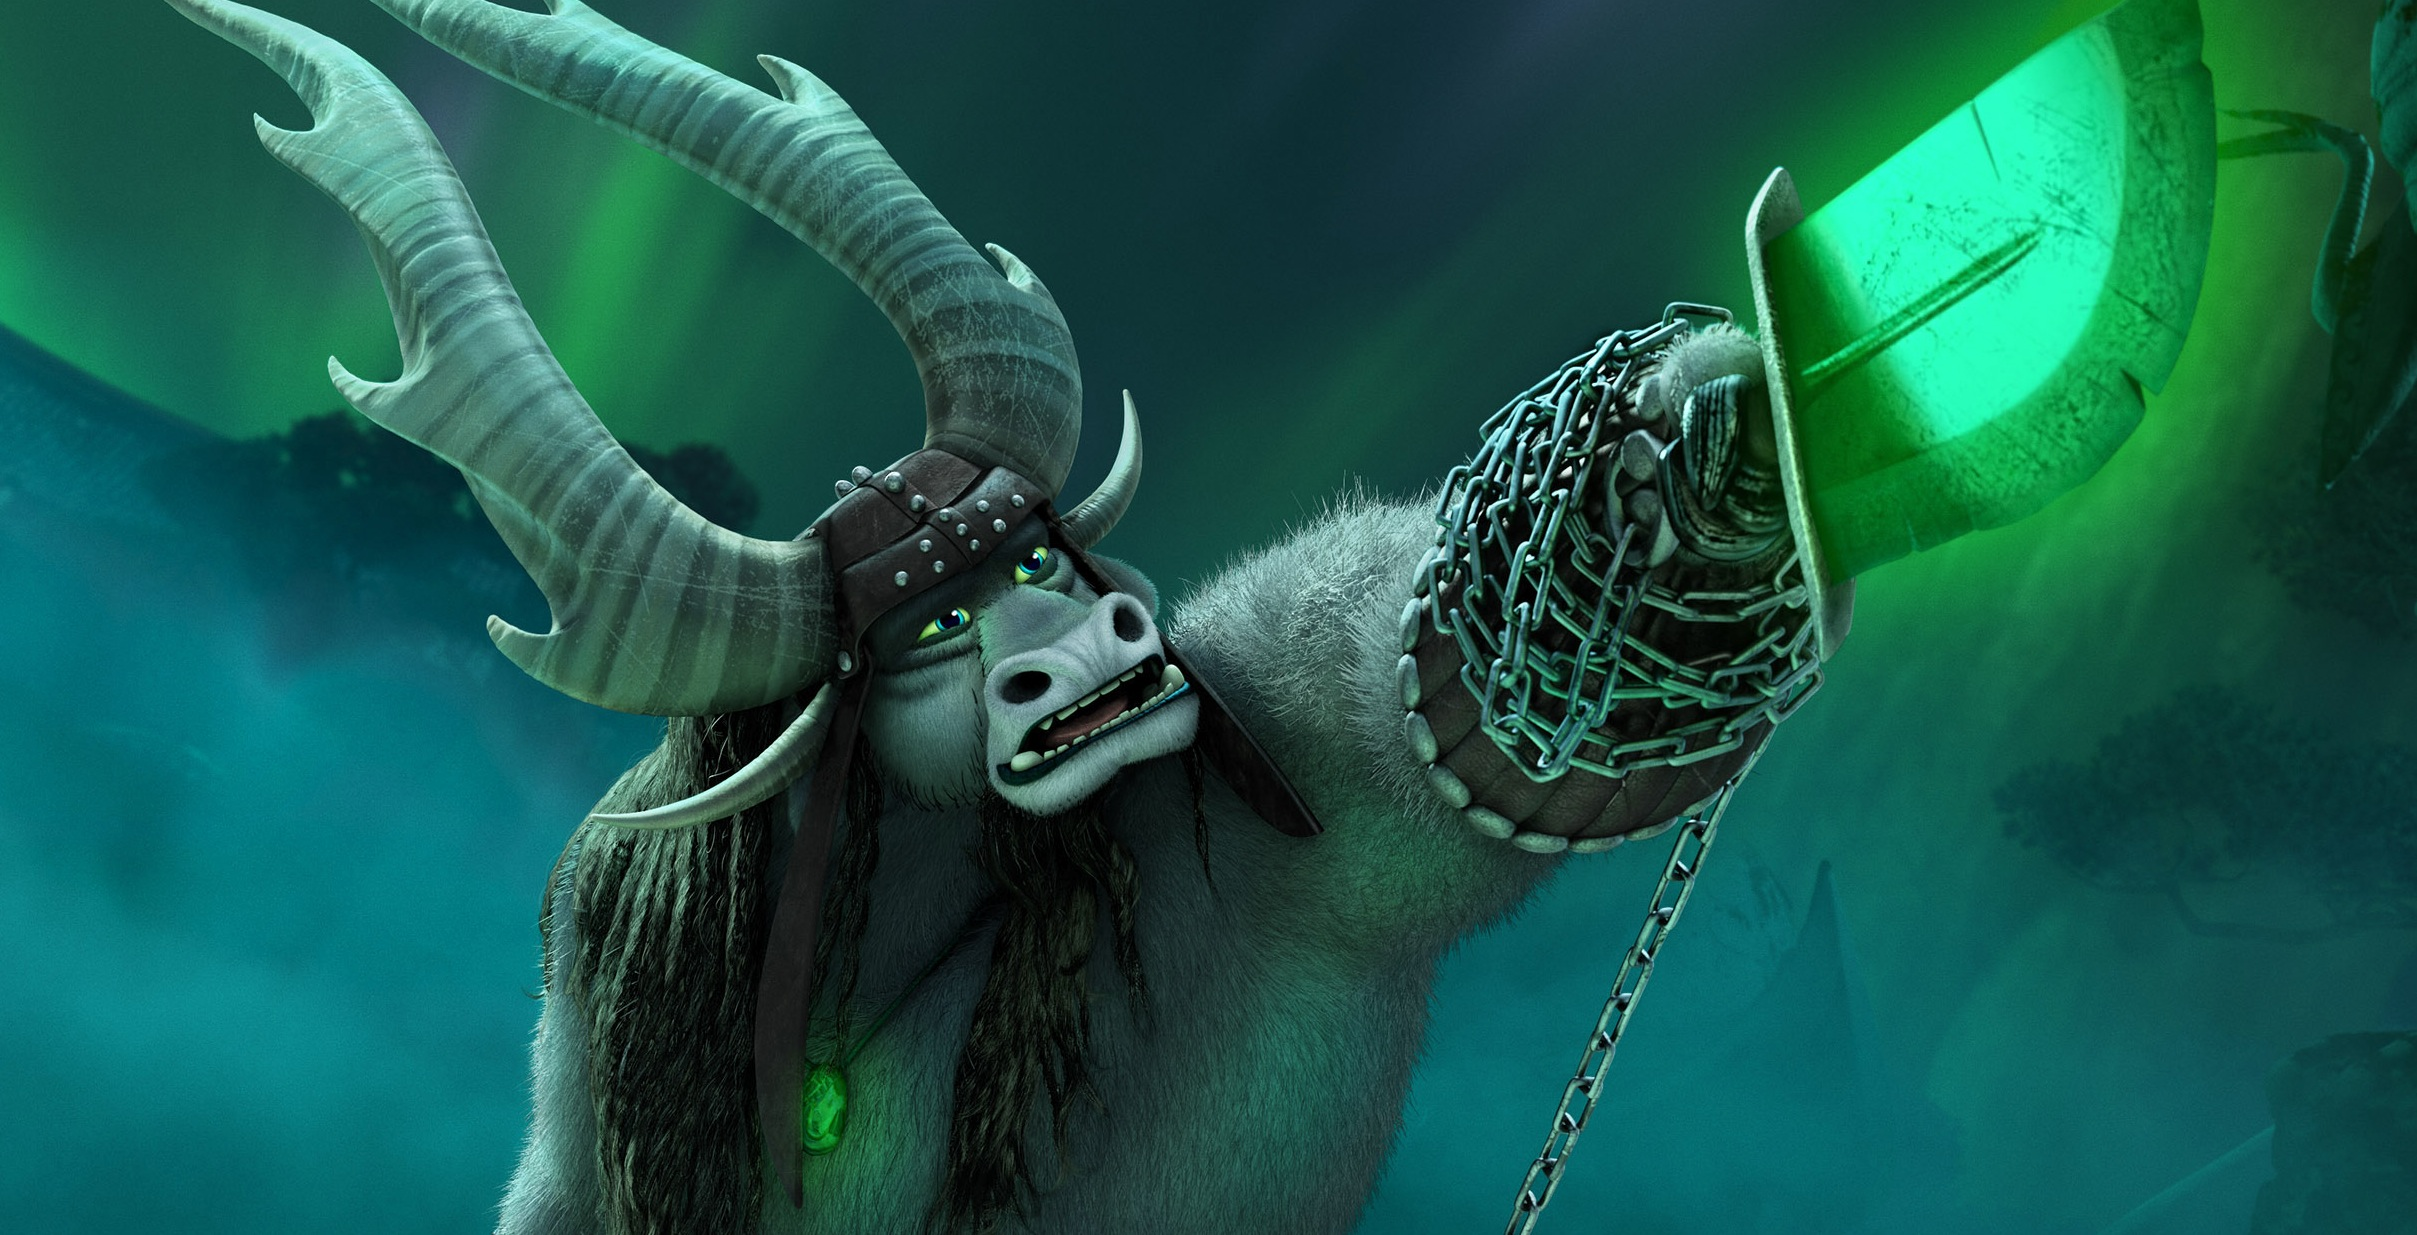 Comcast Buys DreamWorks in $3.8 Billion Deal